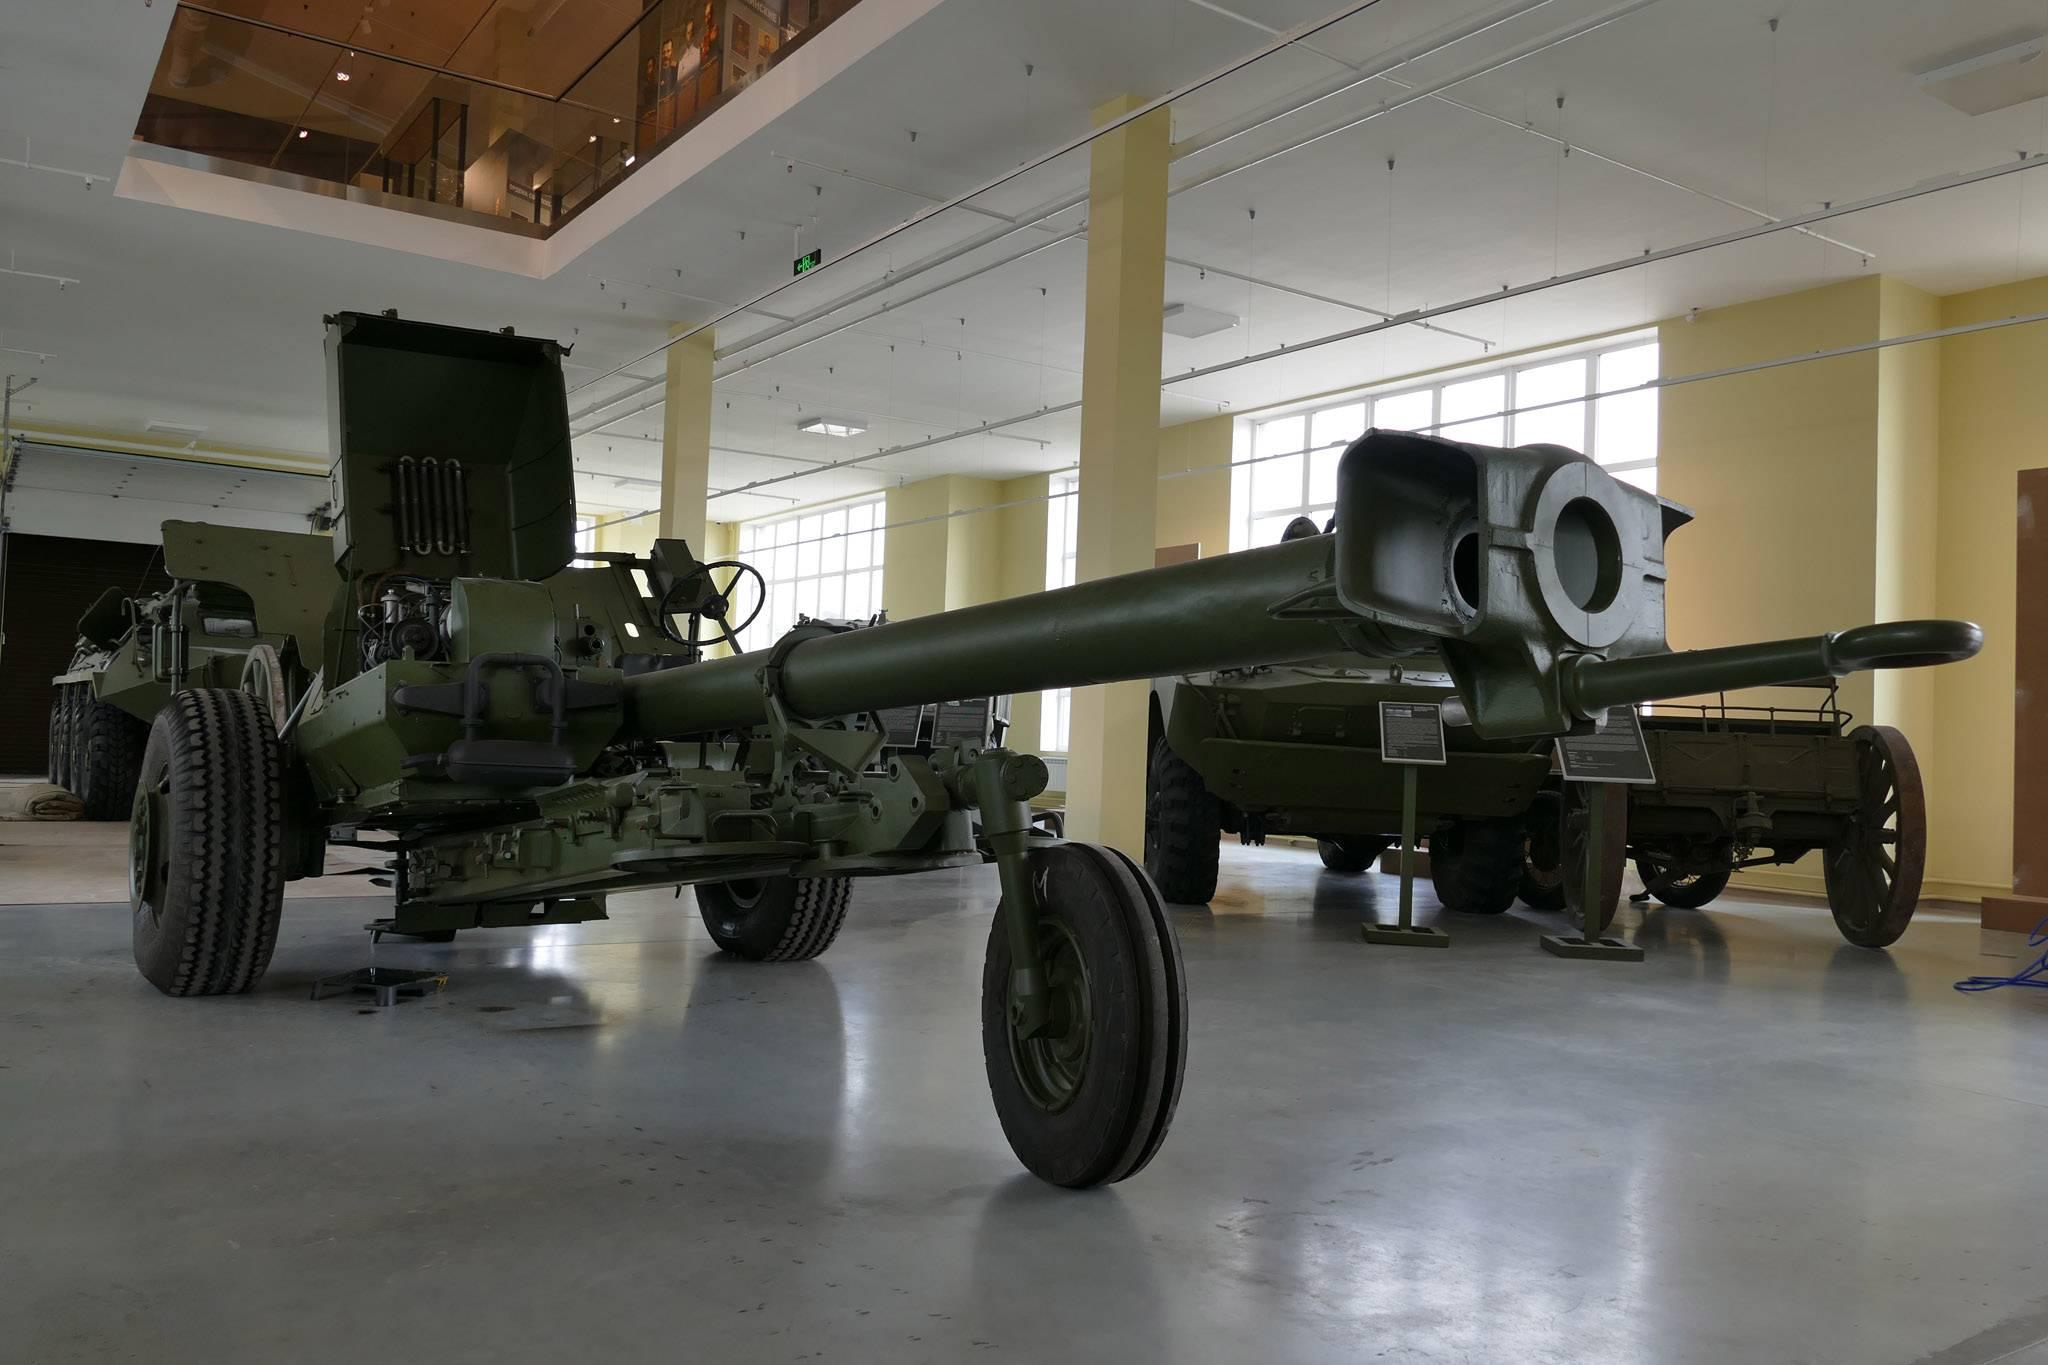 125-мм противотанковая пушка 2а-45м «спрут-б» | военный портал